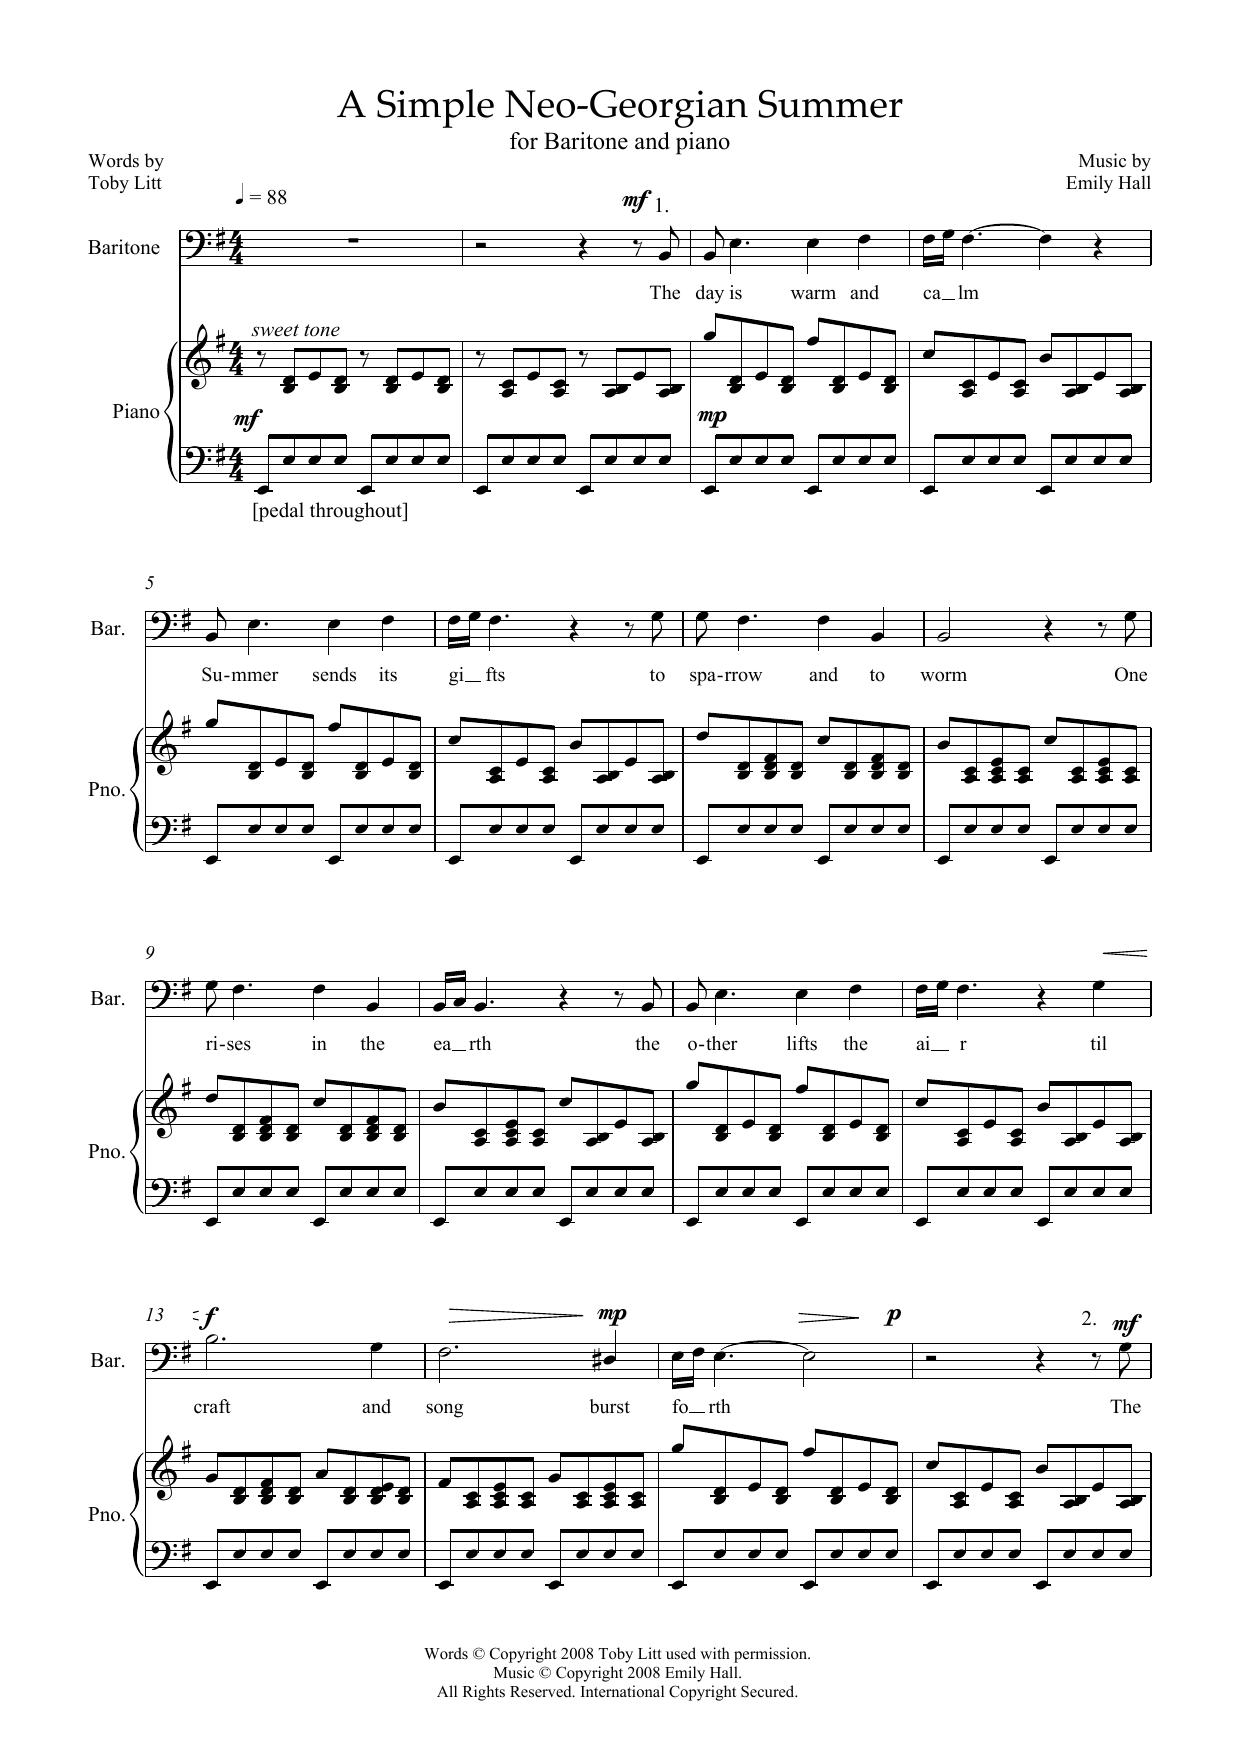 A Simple Neo-Georgian Summer (for baritone and piano) (Piano & Vocal)